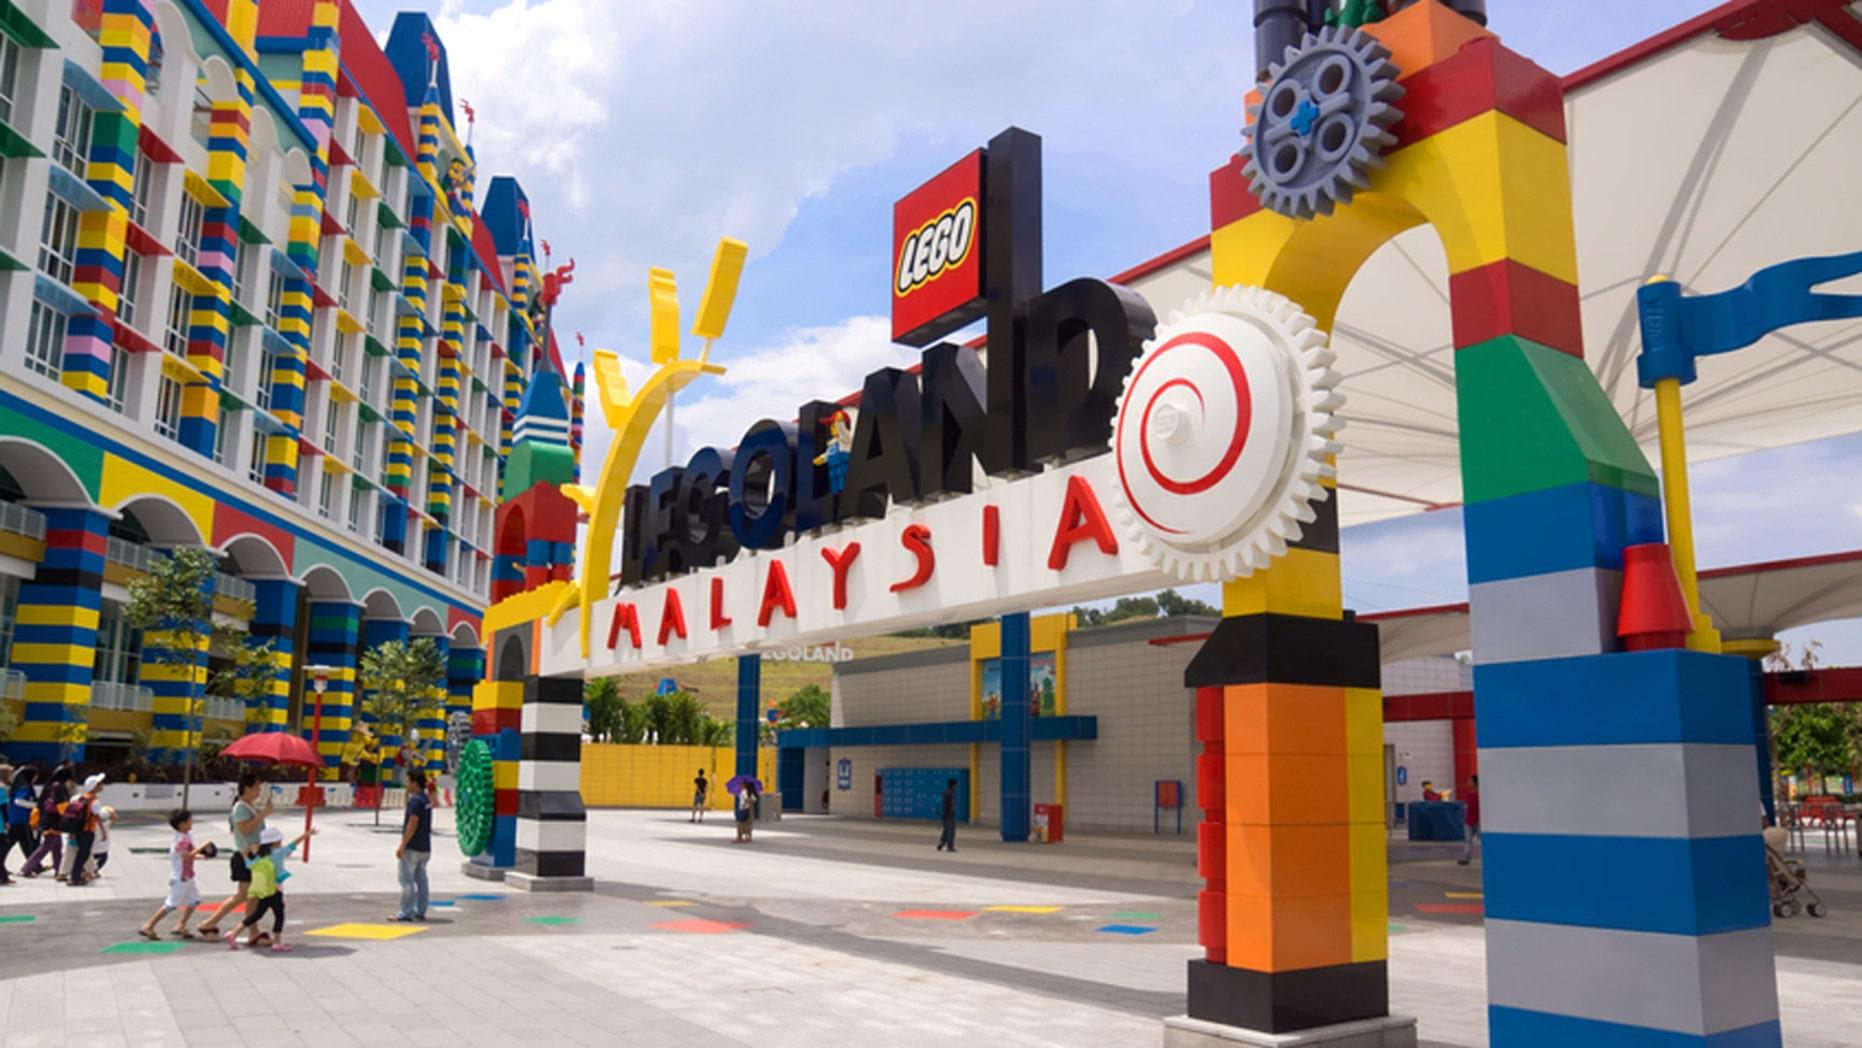 Legoland operates six theme park properties throughout the world.